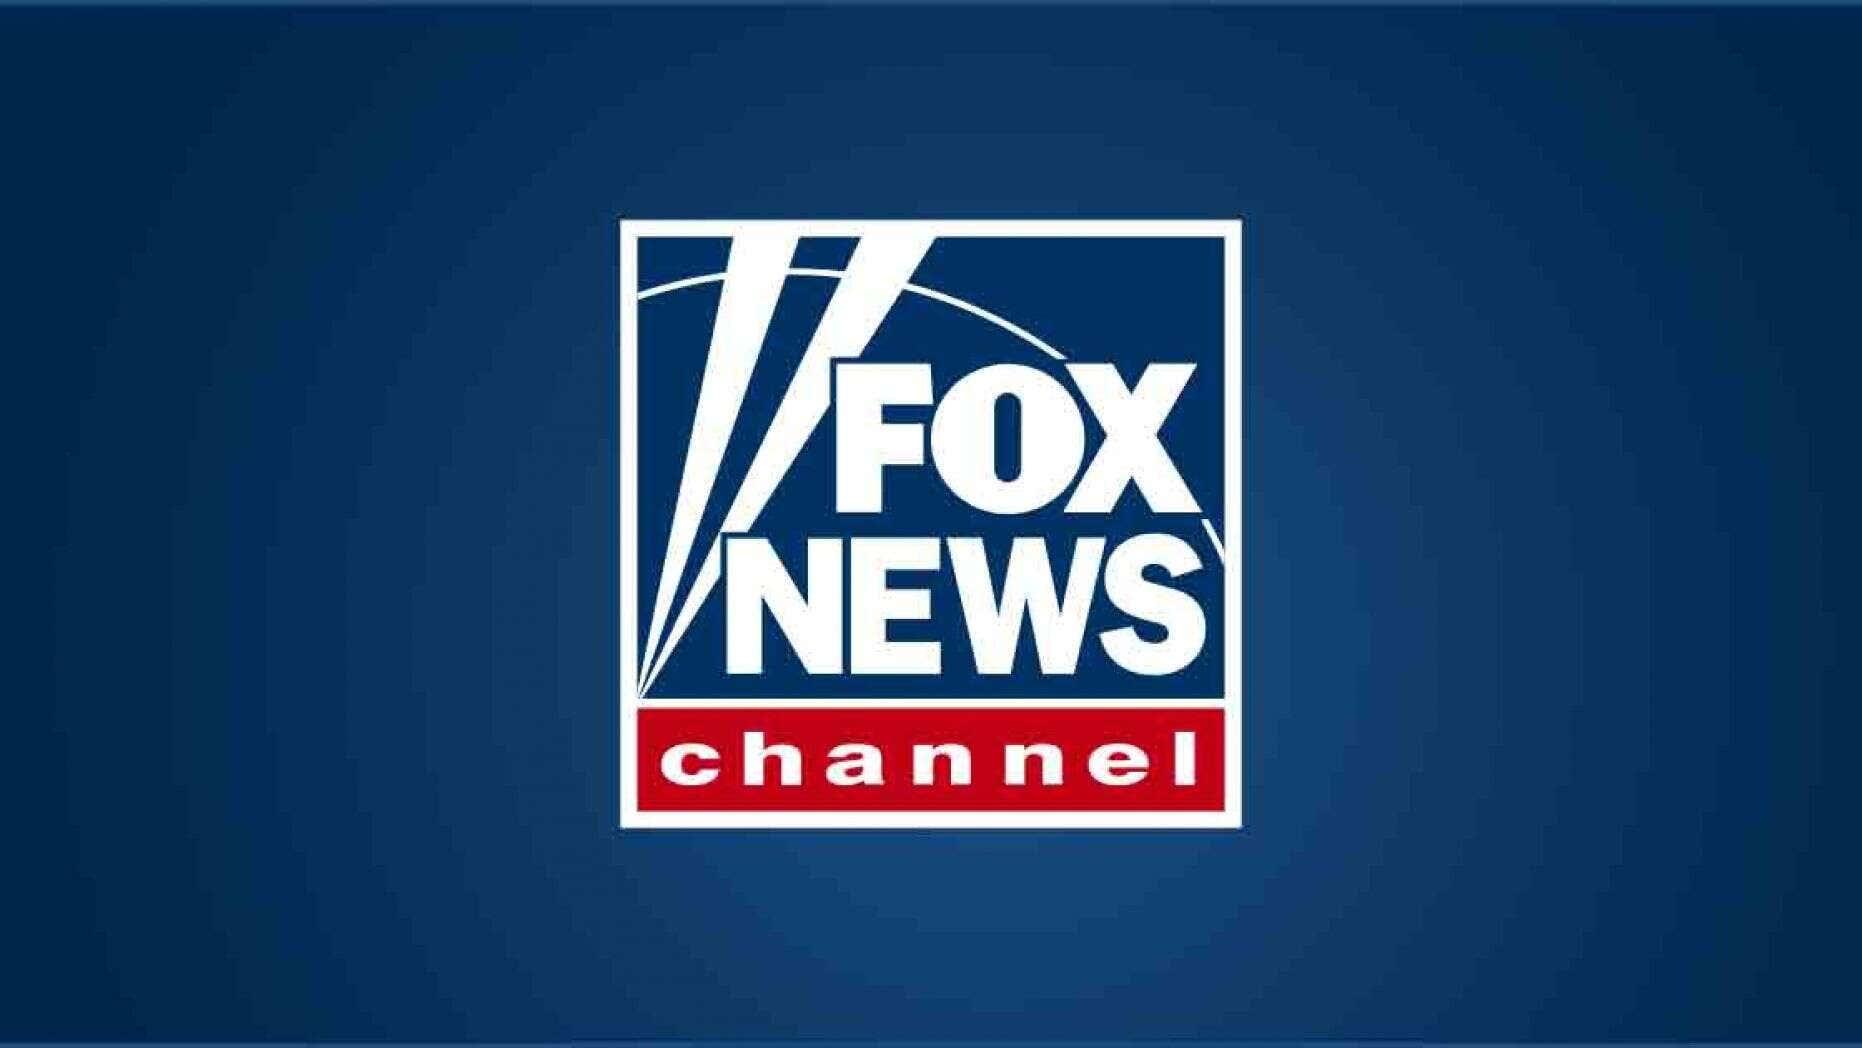 Today on Fox News, Nov. 8, 2019